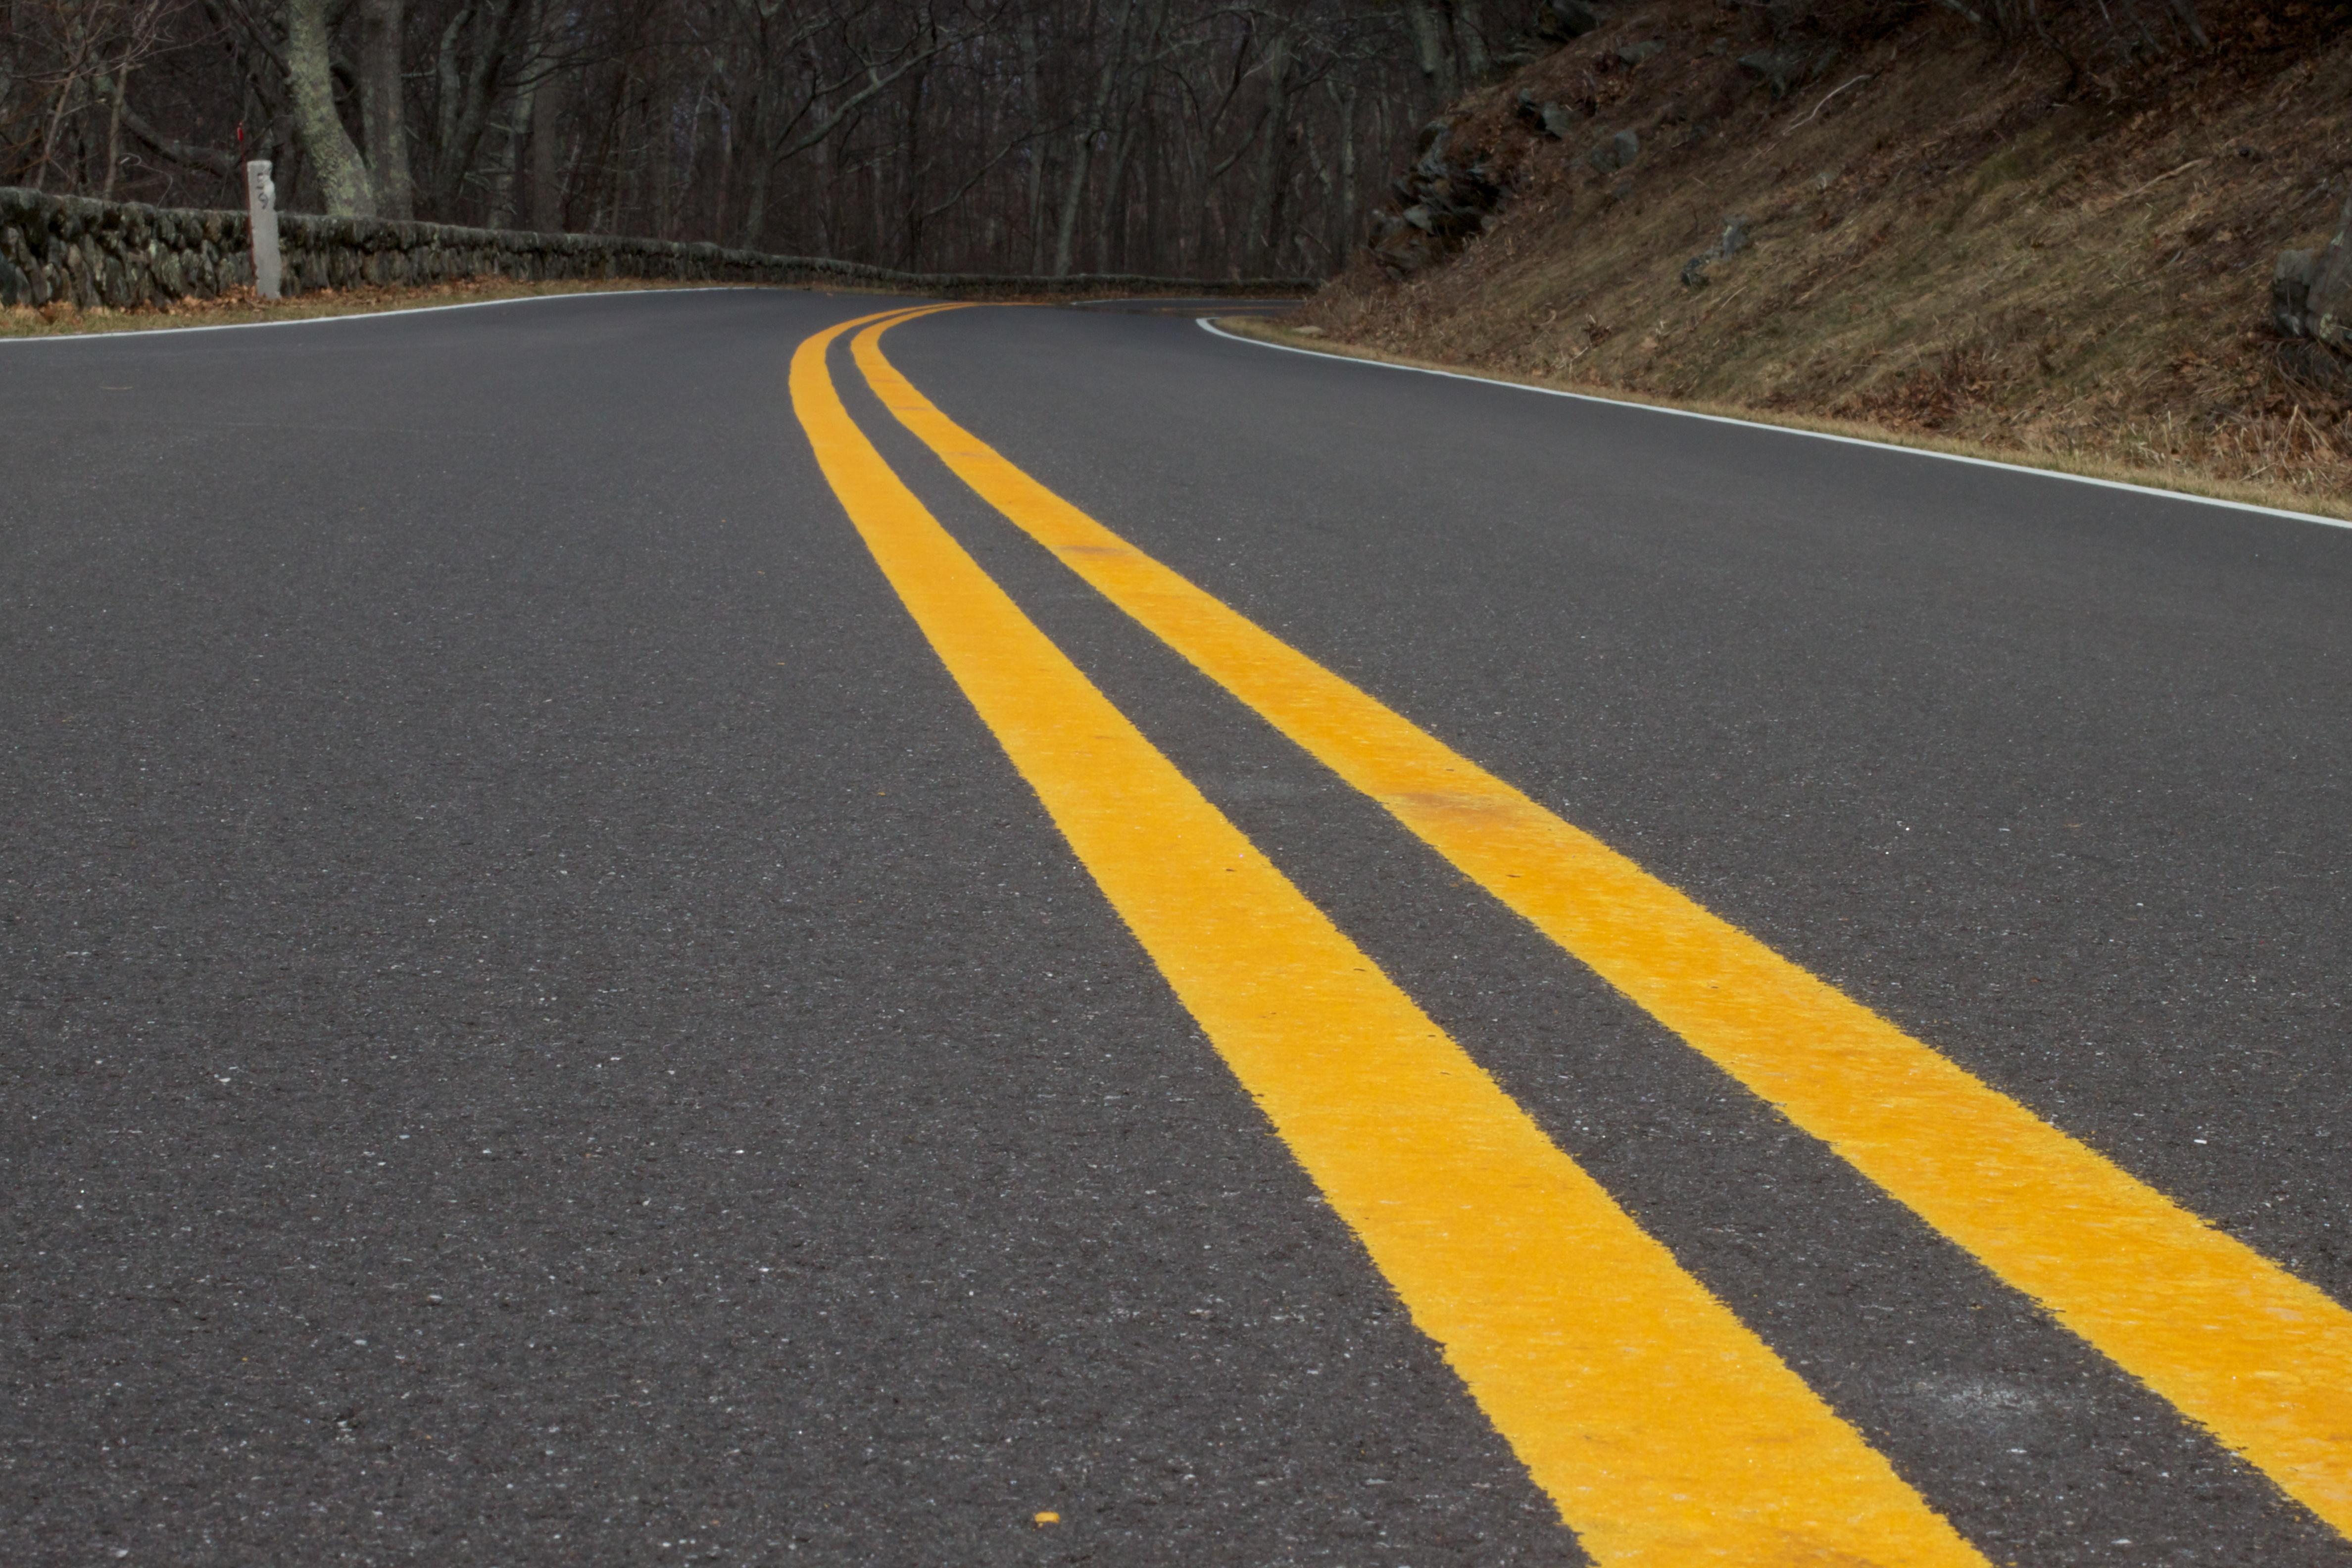 картинки разметок дорог сумел доступно